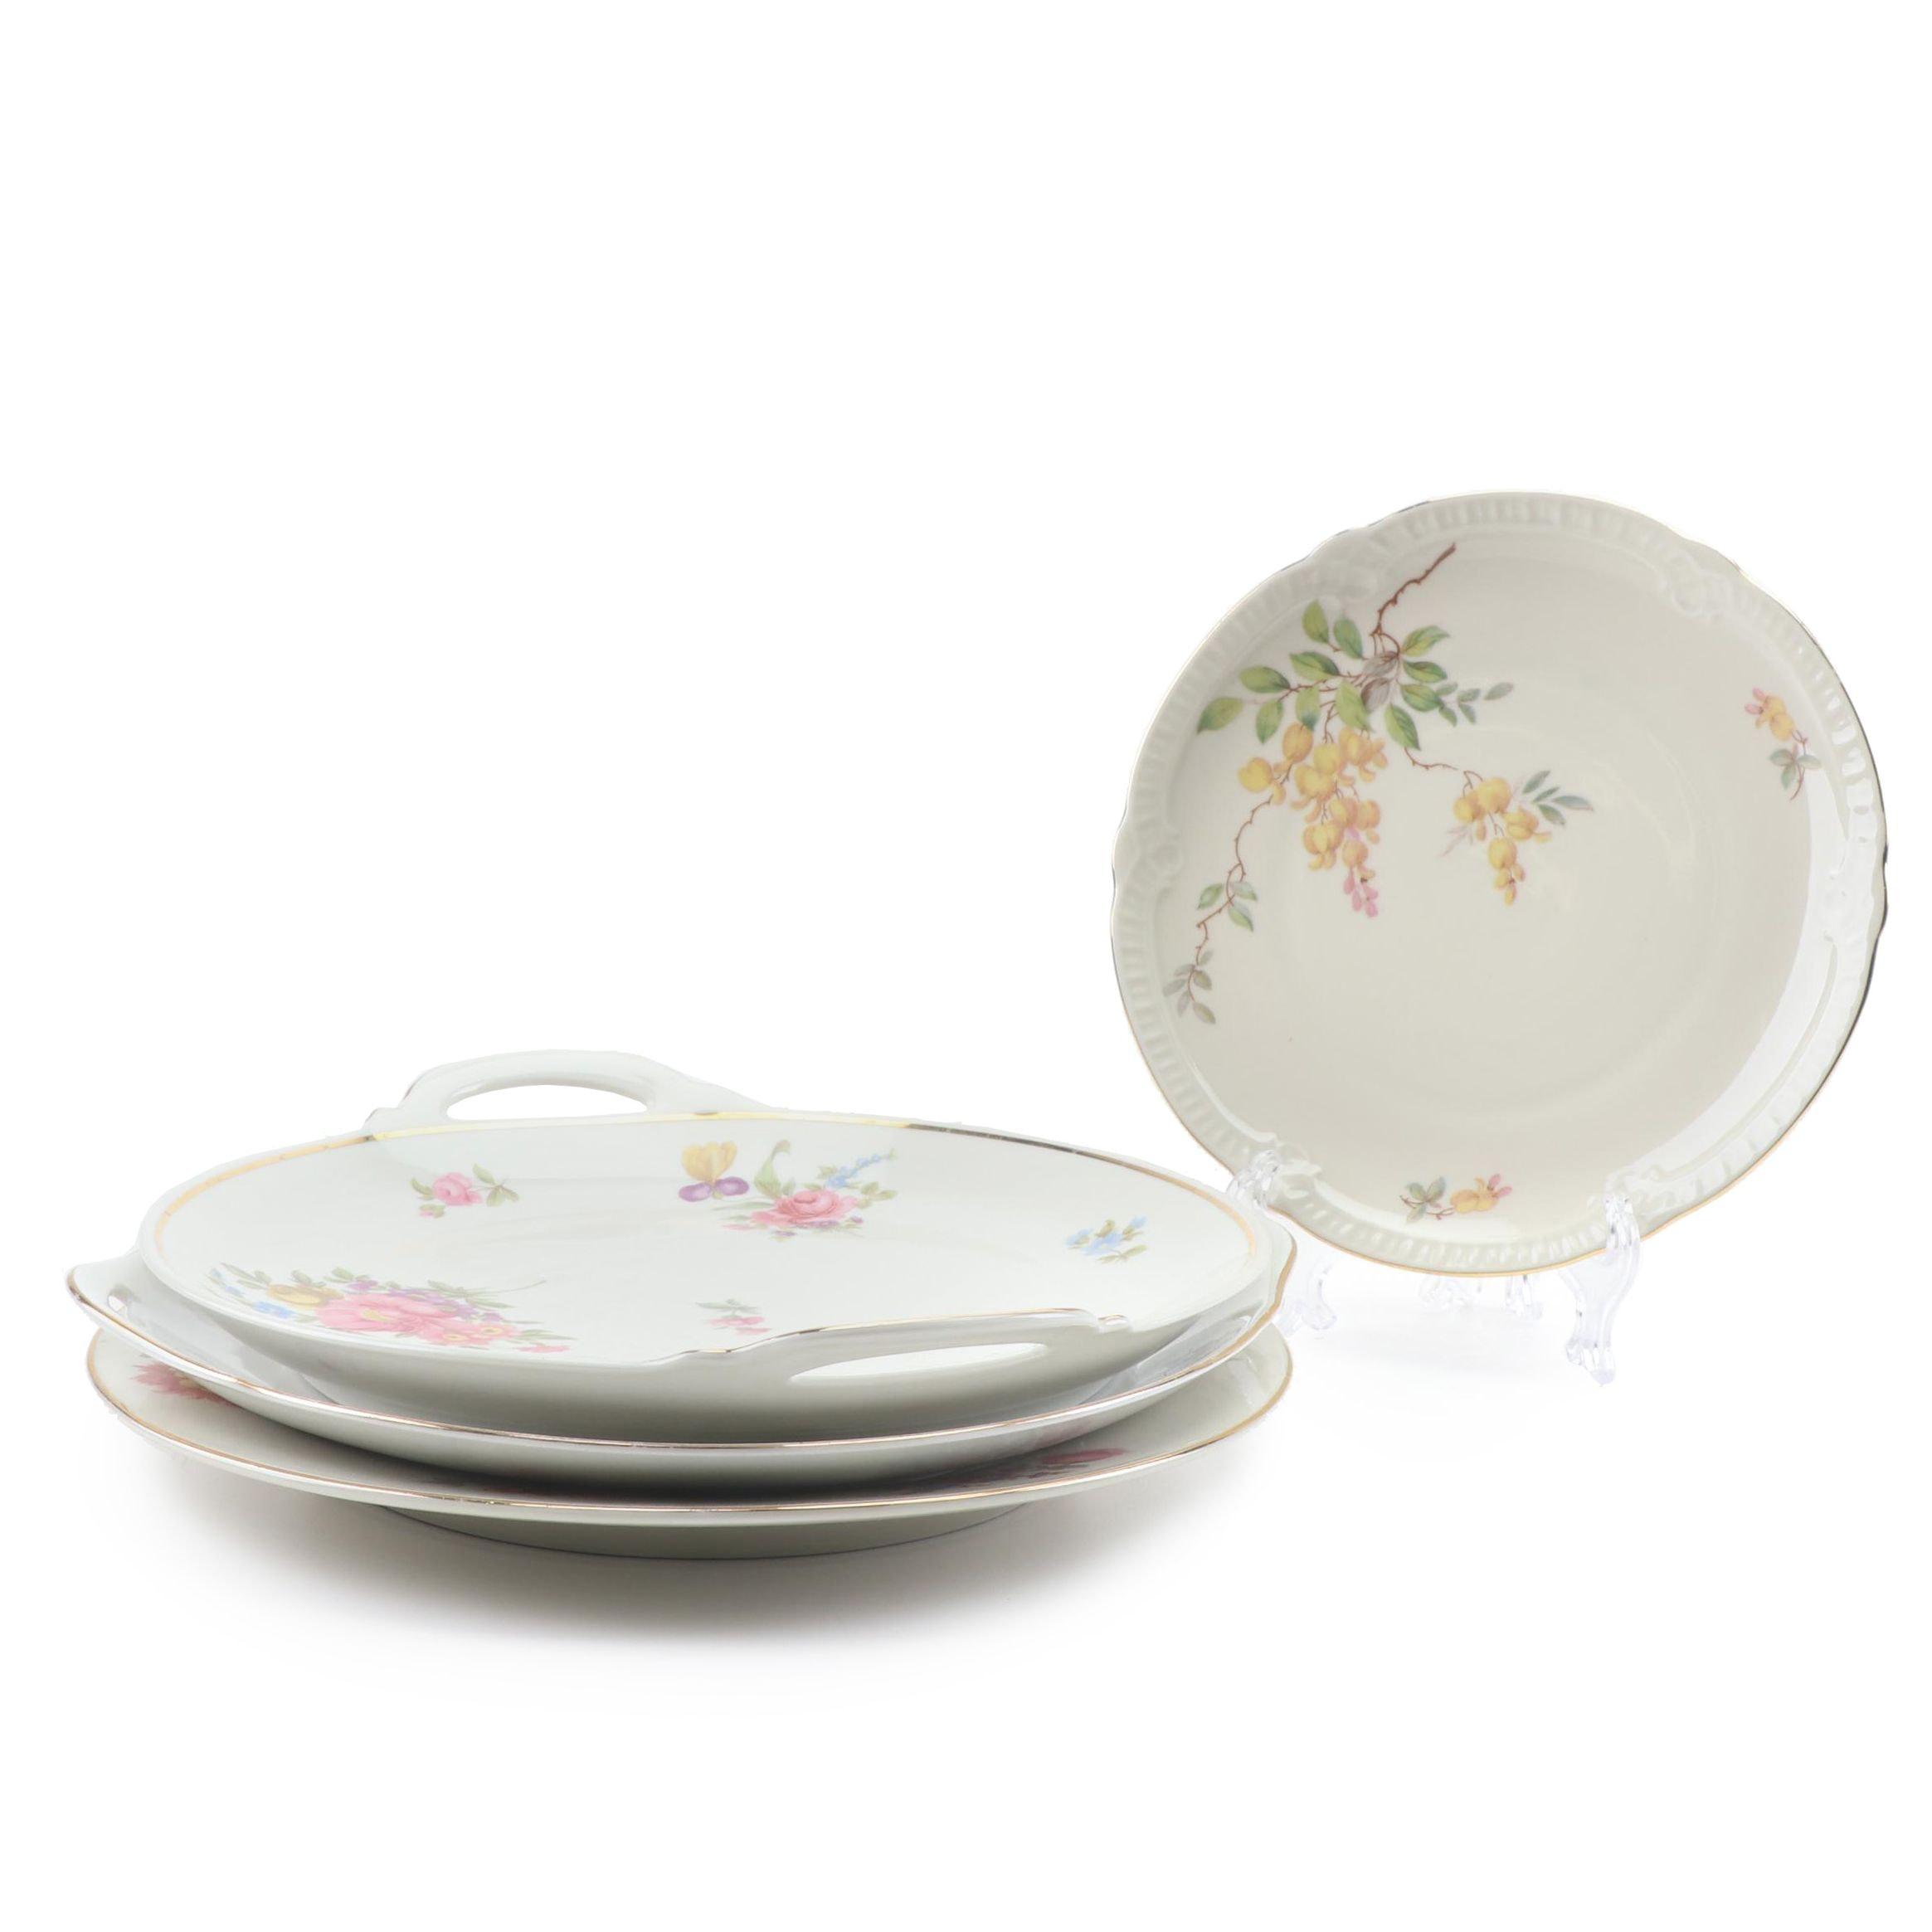 German Floral Porcelain and Ceramic Dinnerware featuring Johann Haviland